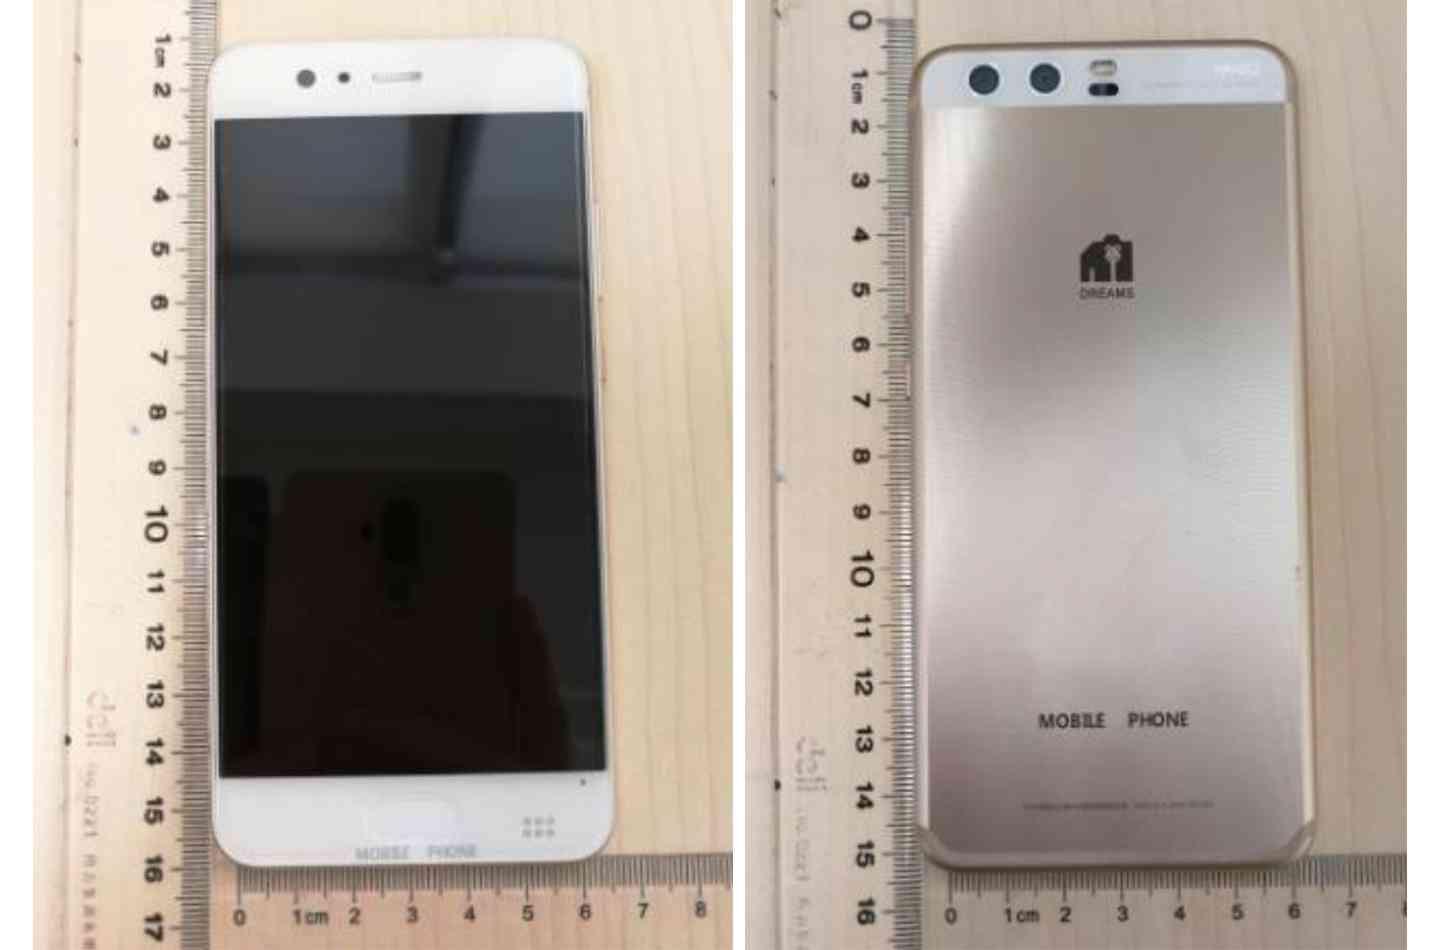 Huawei P10 images leak FCC